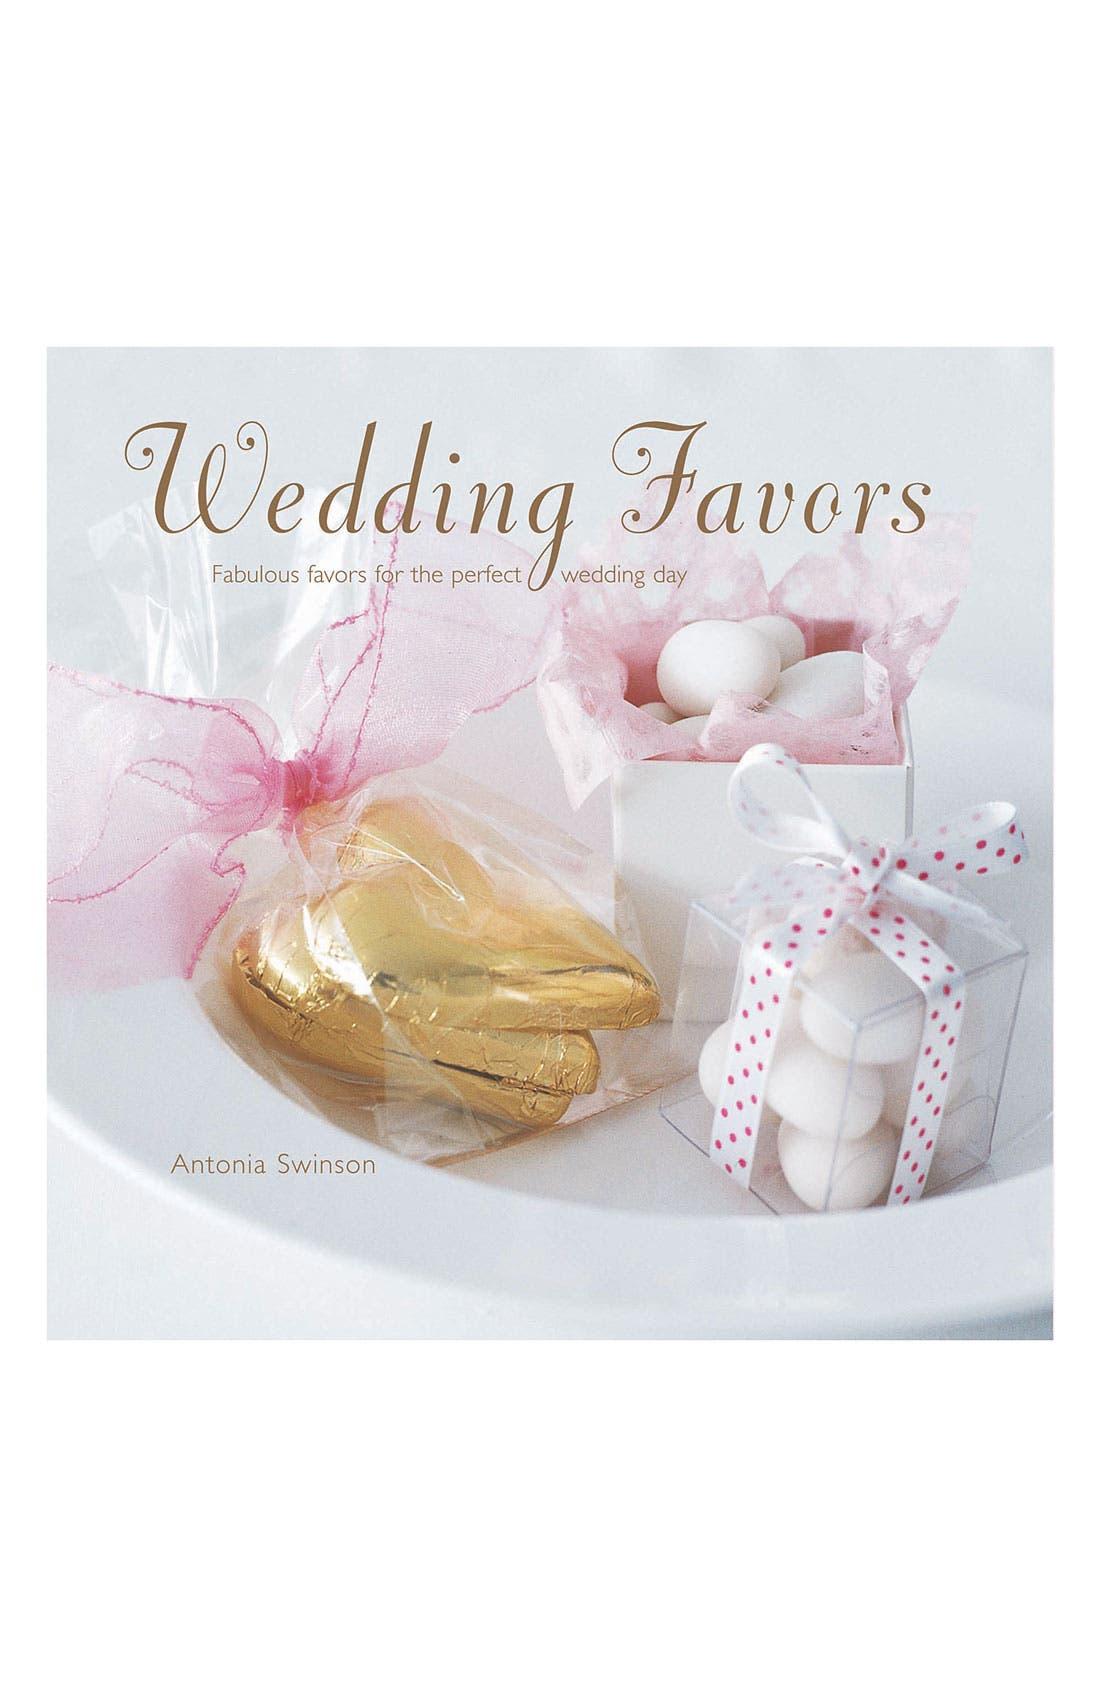 Alternate Image 1 Selected - 'Wedding Favors' Book